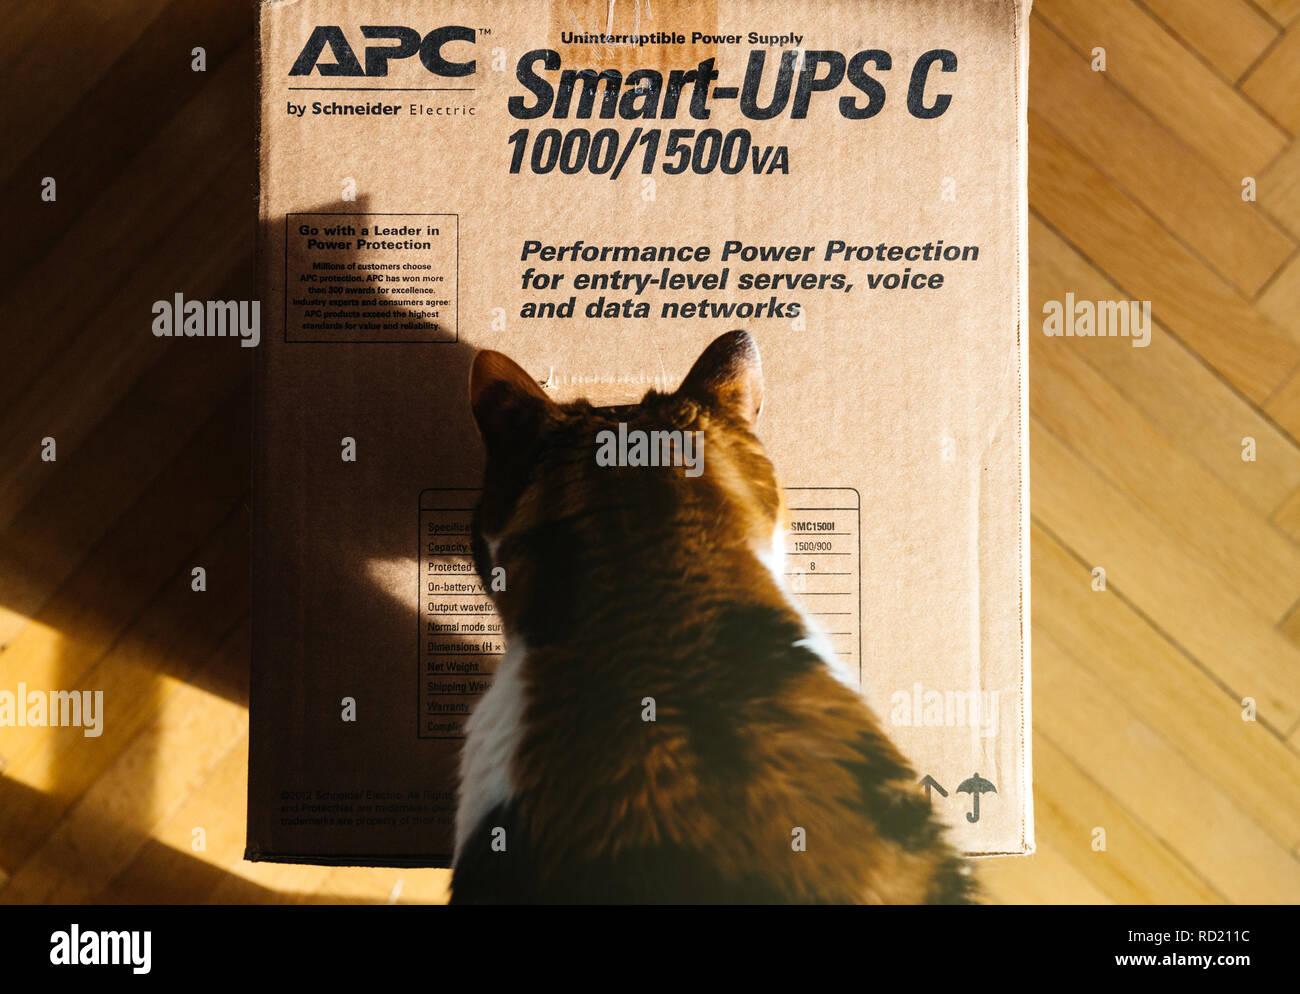 PARIS, FRANCE - MAR 29, 2018: Curious cat inspecting APC Smart-UPS C